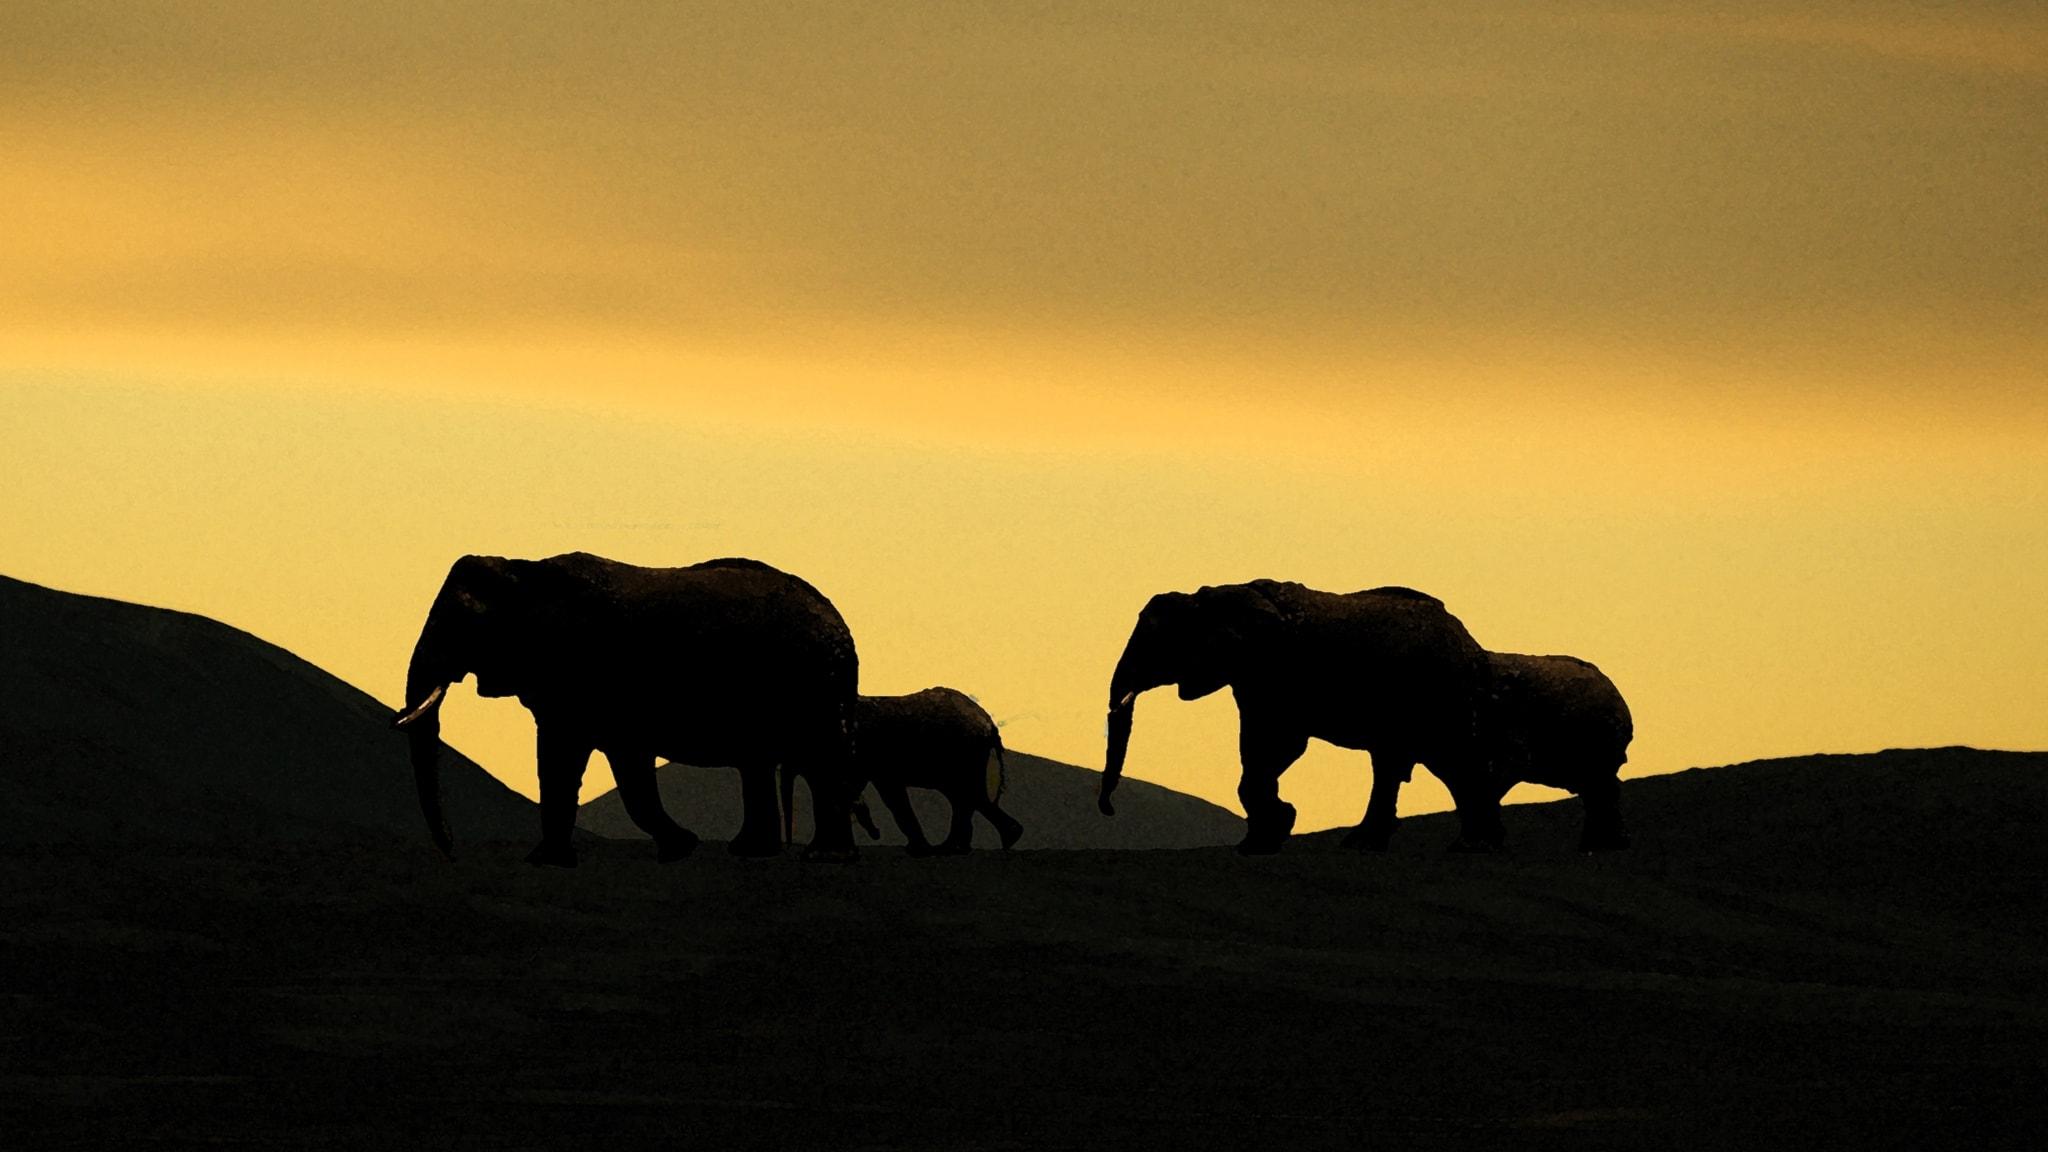 Musatarina: Norsu vai elefantti?